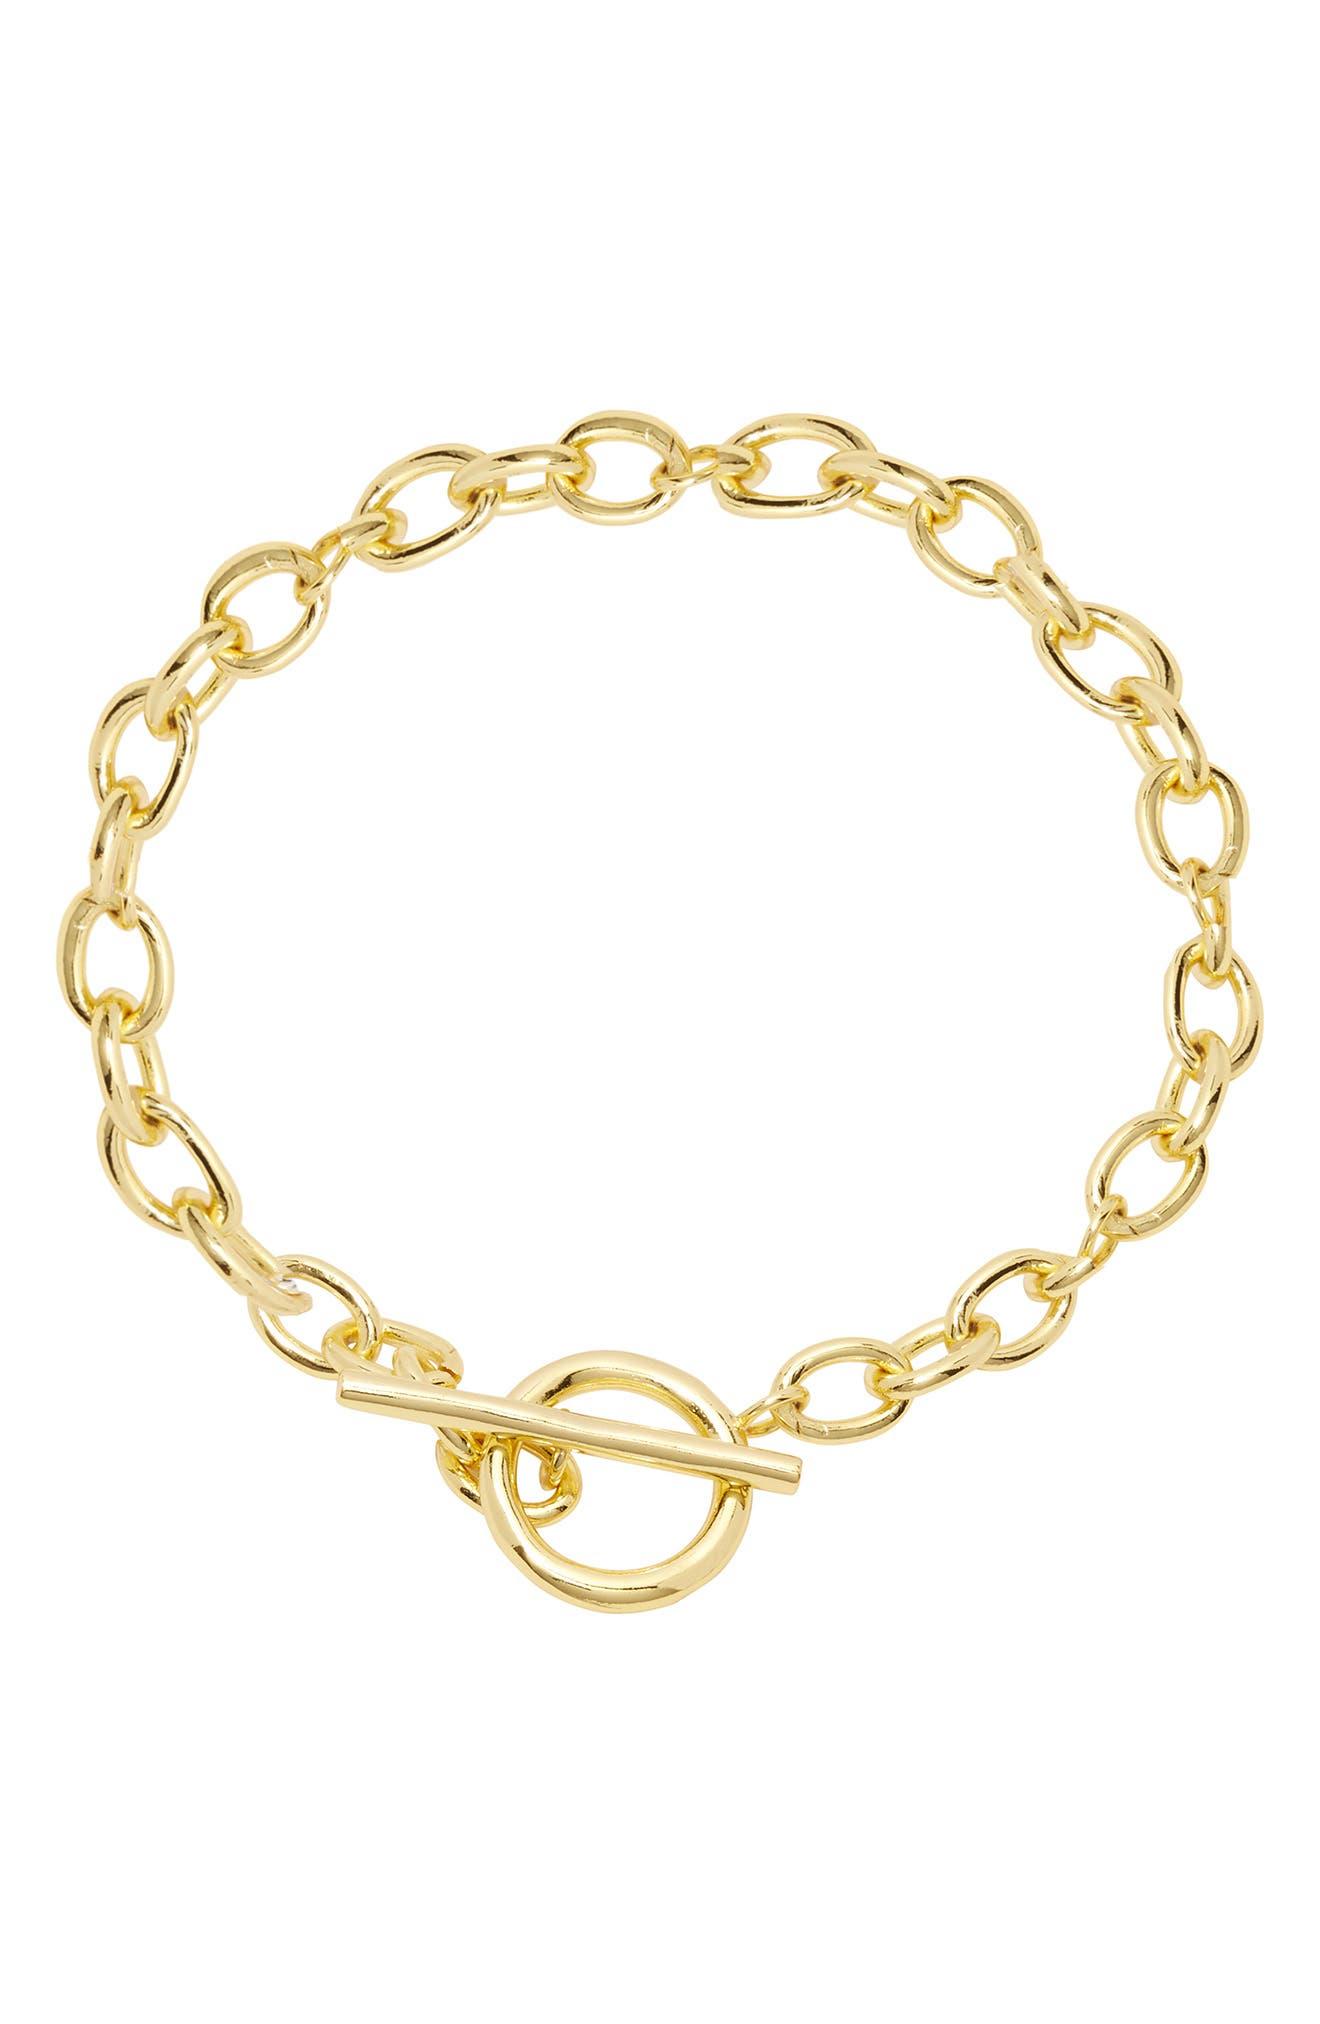 Women Fashion Boot Chains Bracelet Gold Metal Shoe Charm Chunky Textured Links